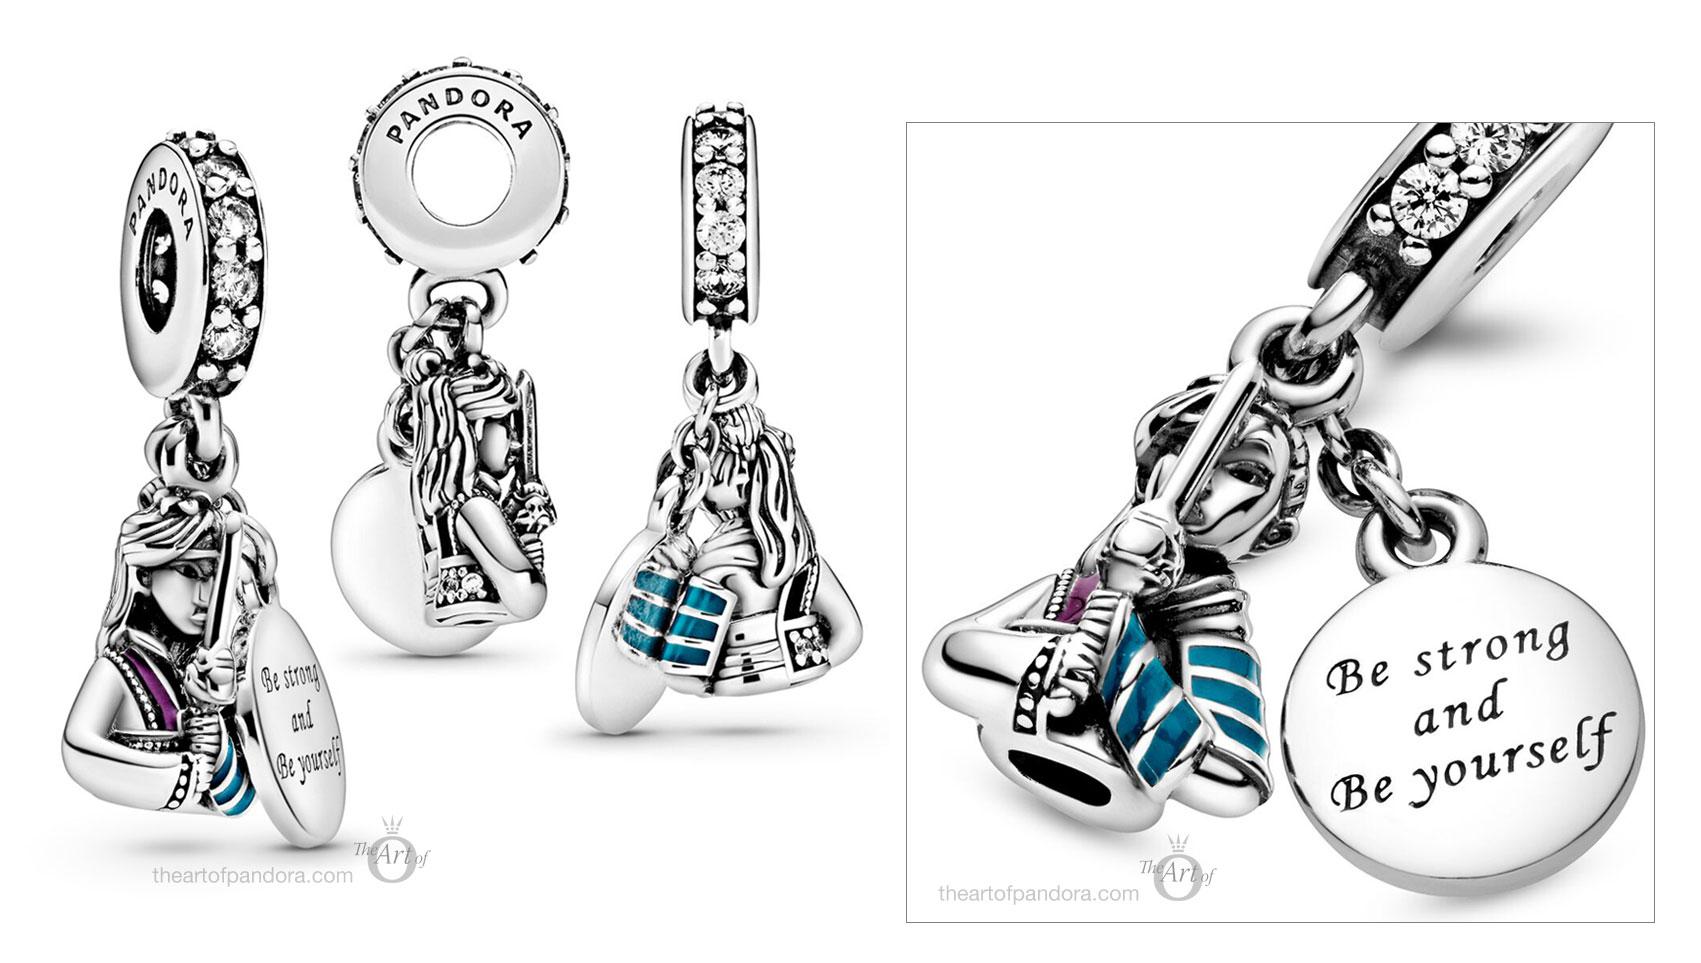 798637C01-Pandora-disney-mulan-dangle-charm - The Art of Pandora ...